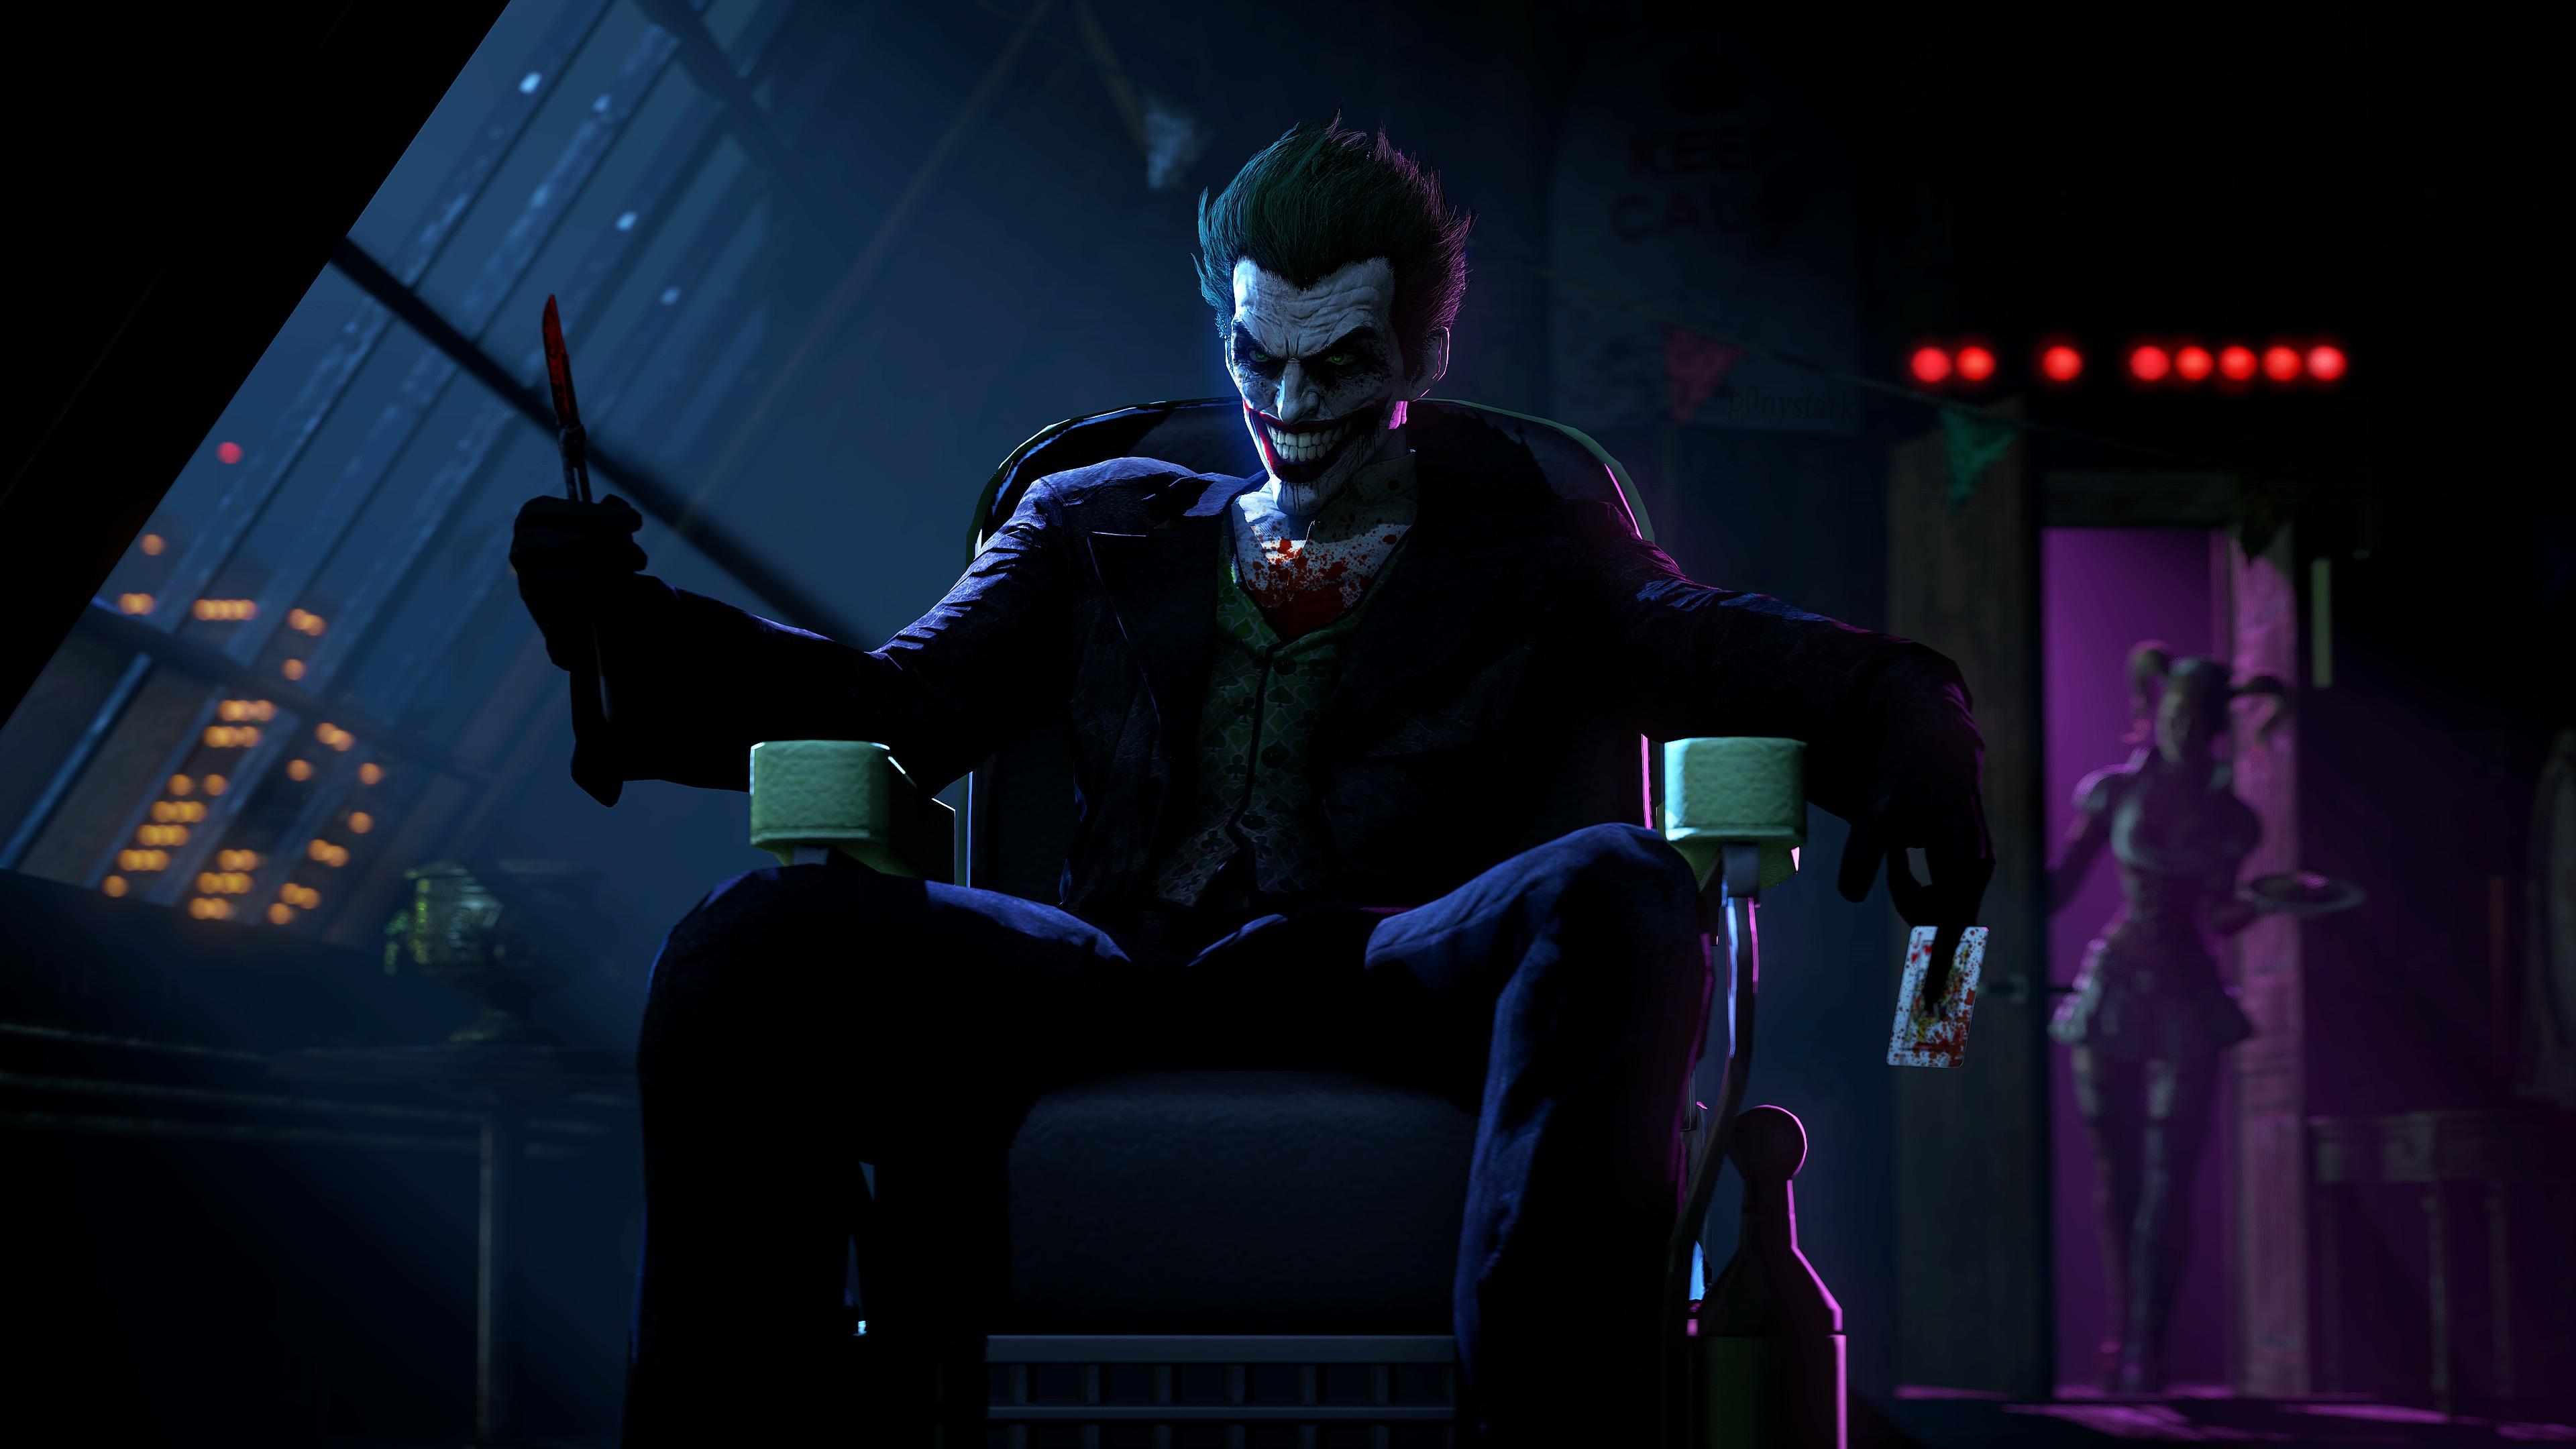 Joker in batman arkham origins hd games 4k wallpapers images joker in batman arkham origins voltagebd Images